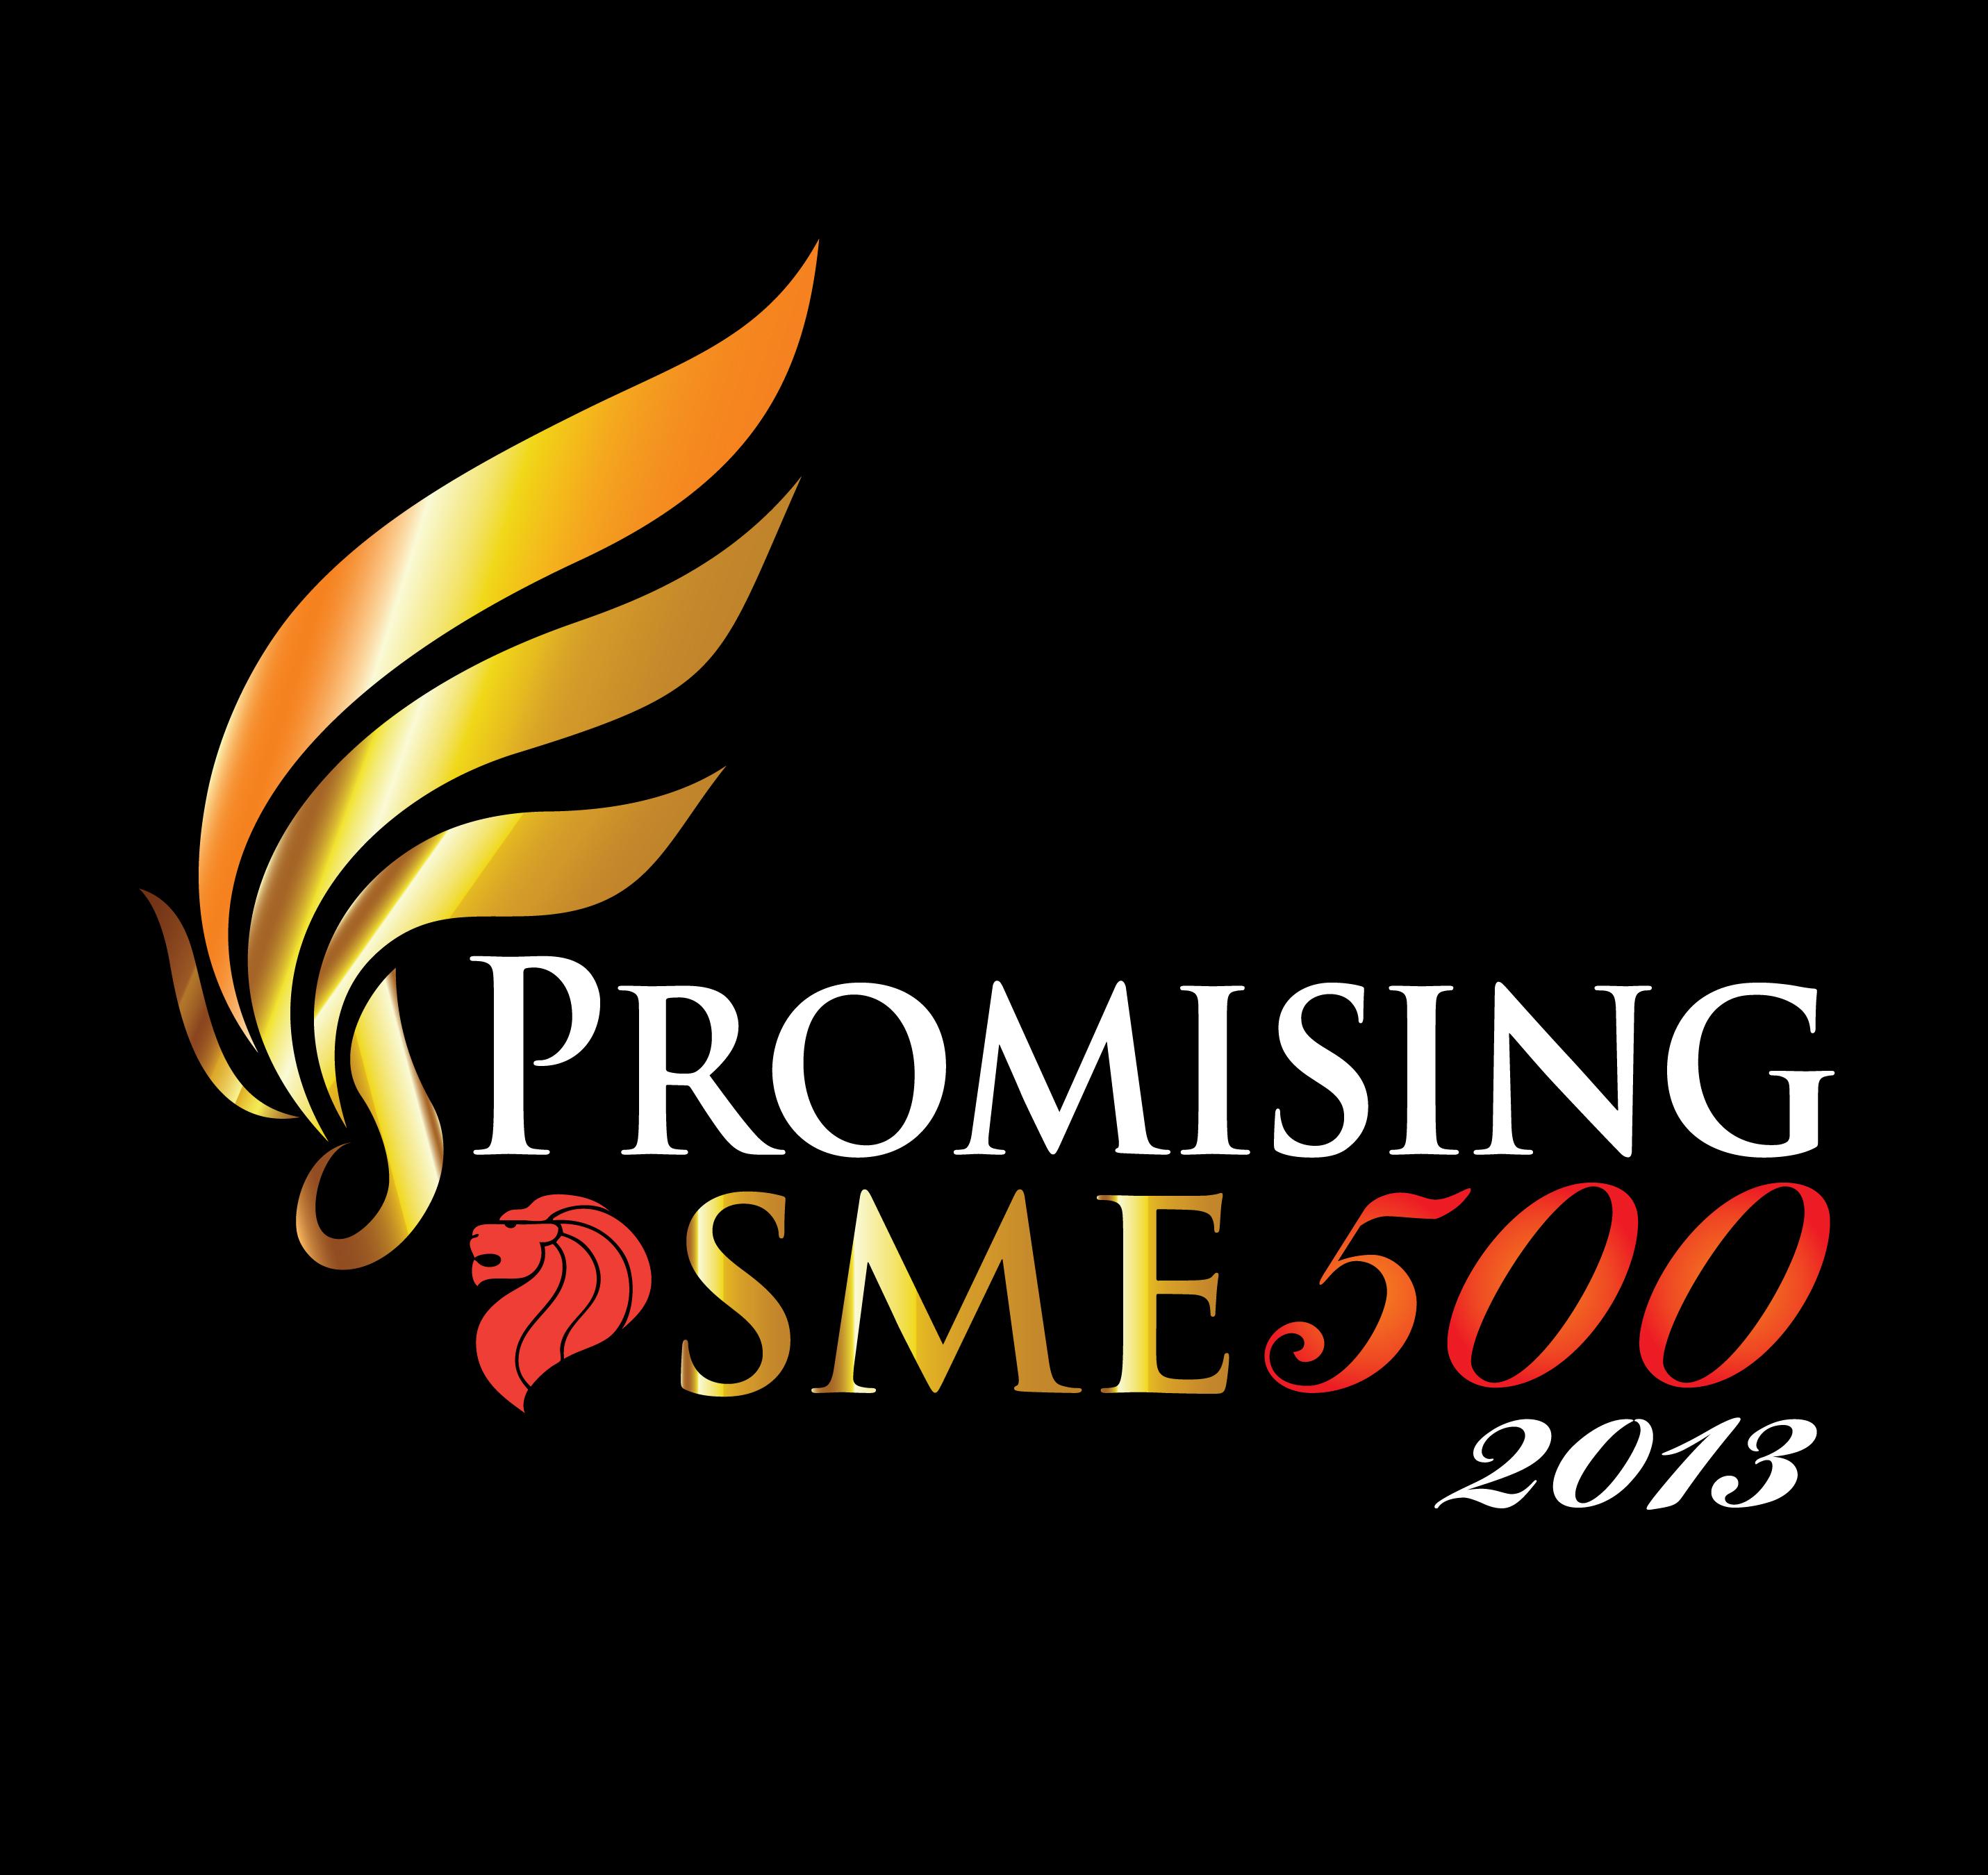 2. Promising SME 500 2013 Logo Black Background